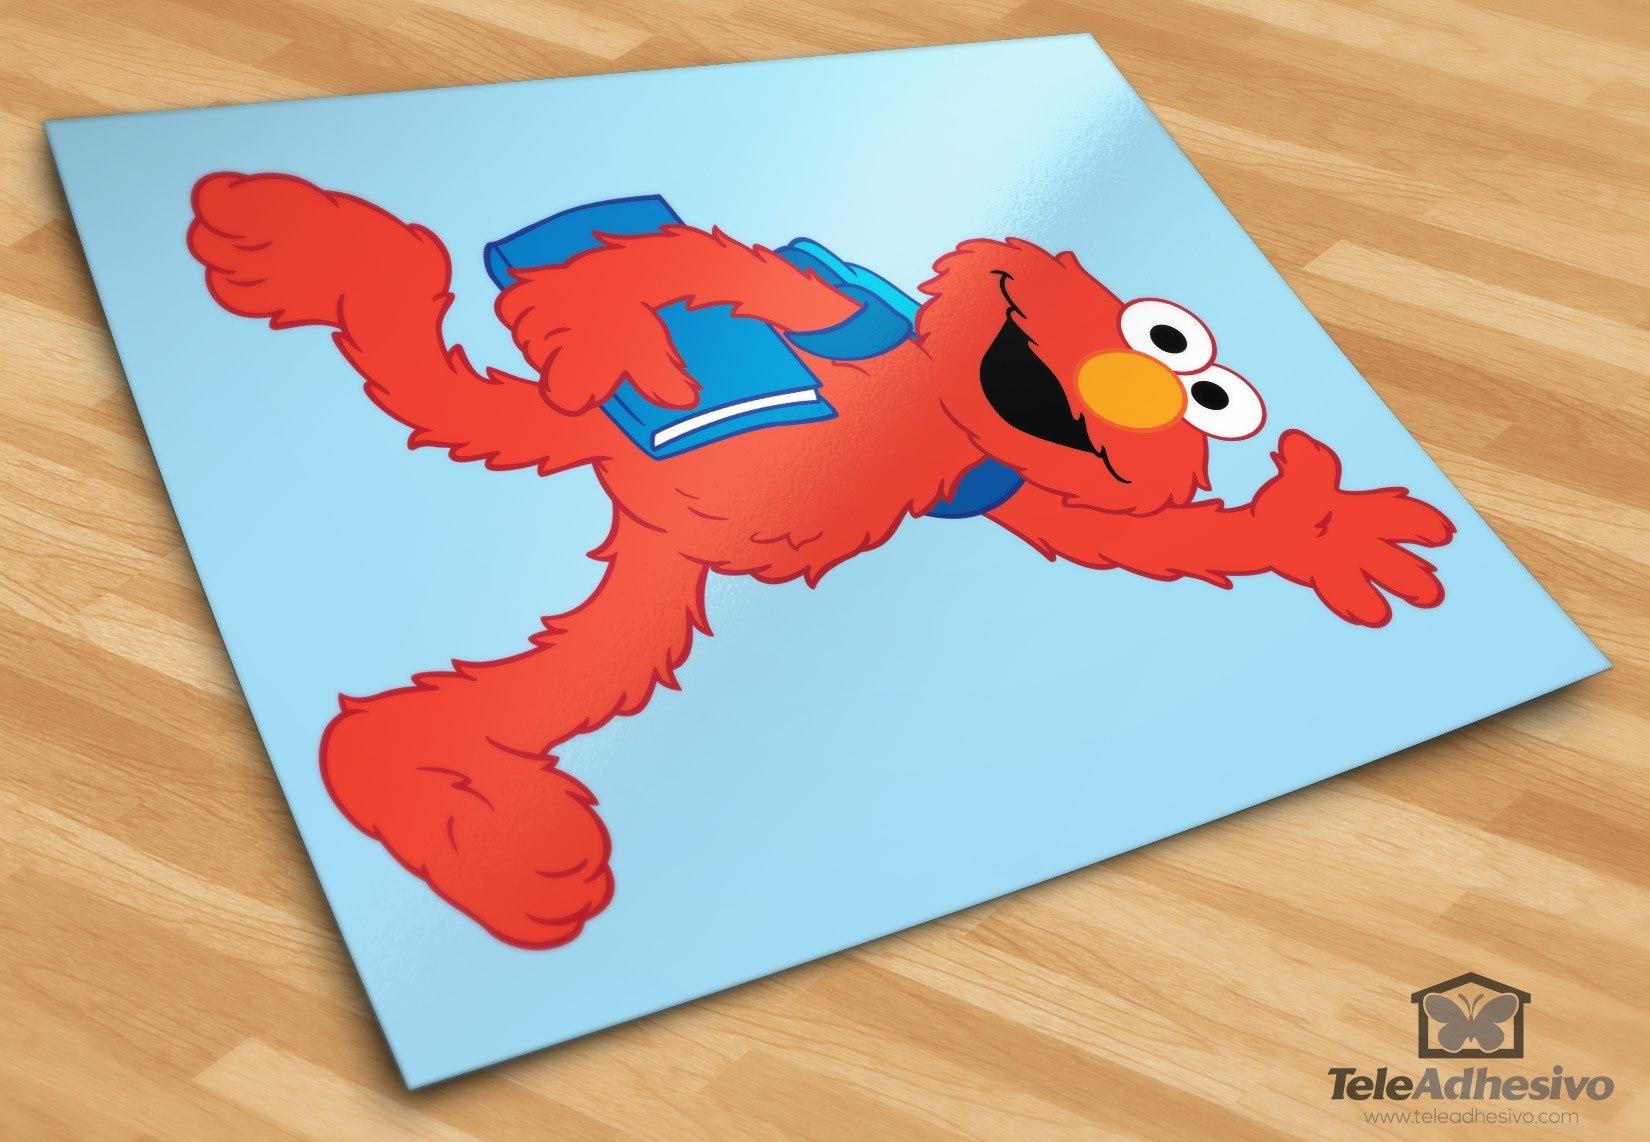 Kinderzimmer Wandtattoo: Elmo Schule